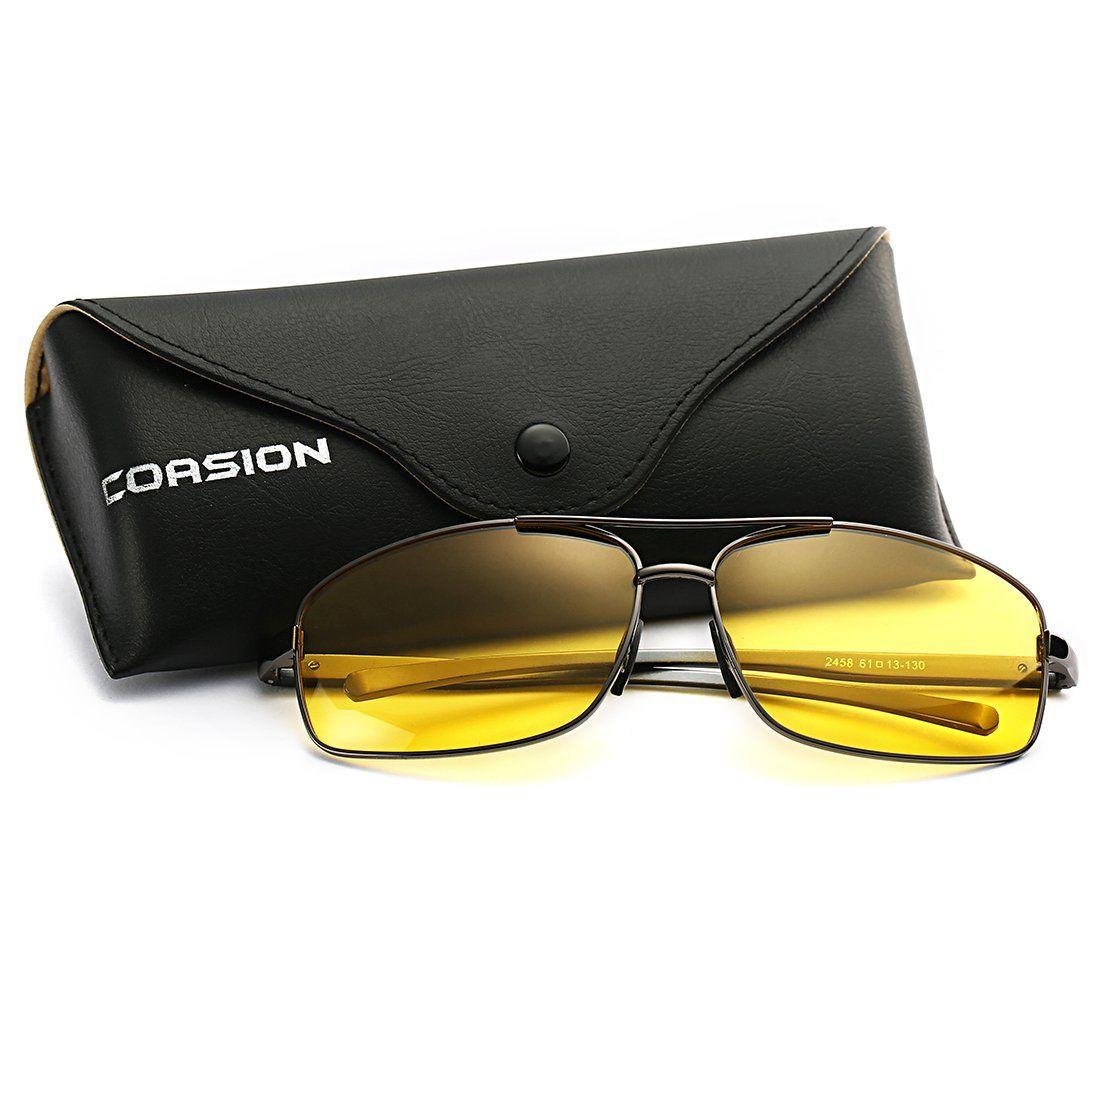 Coasion hd polarized night vision driving glasses large